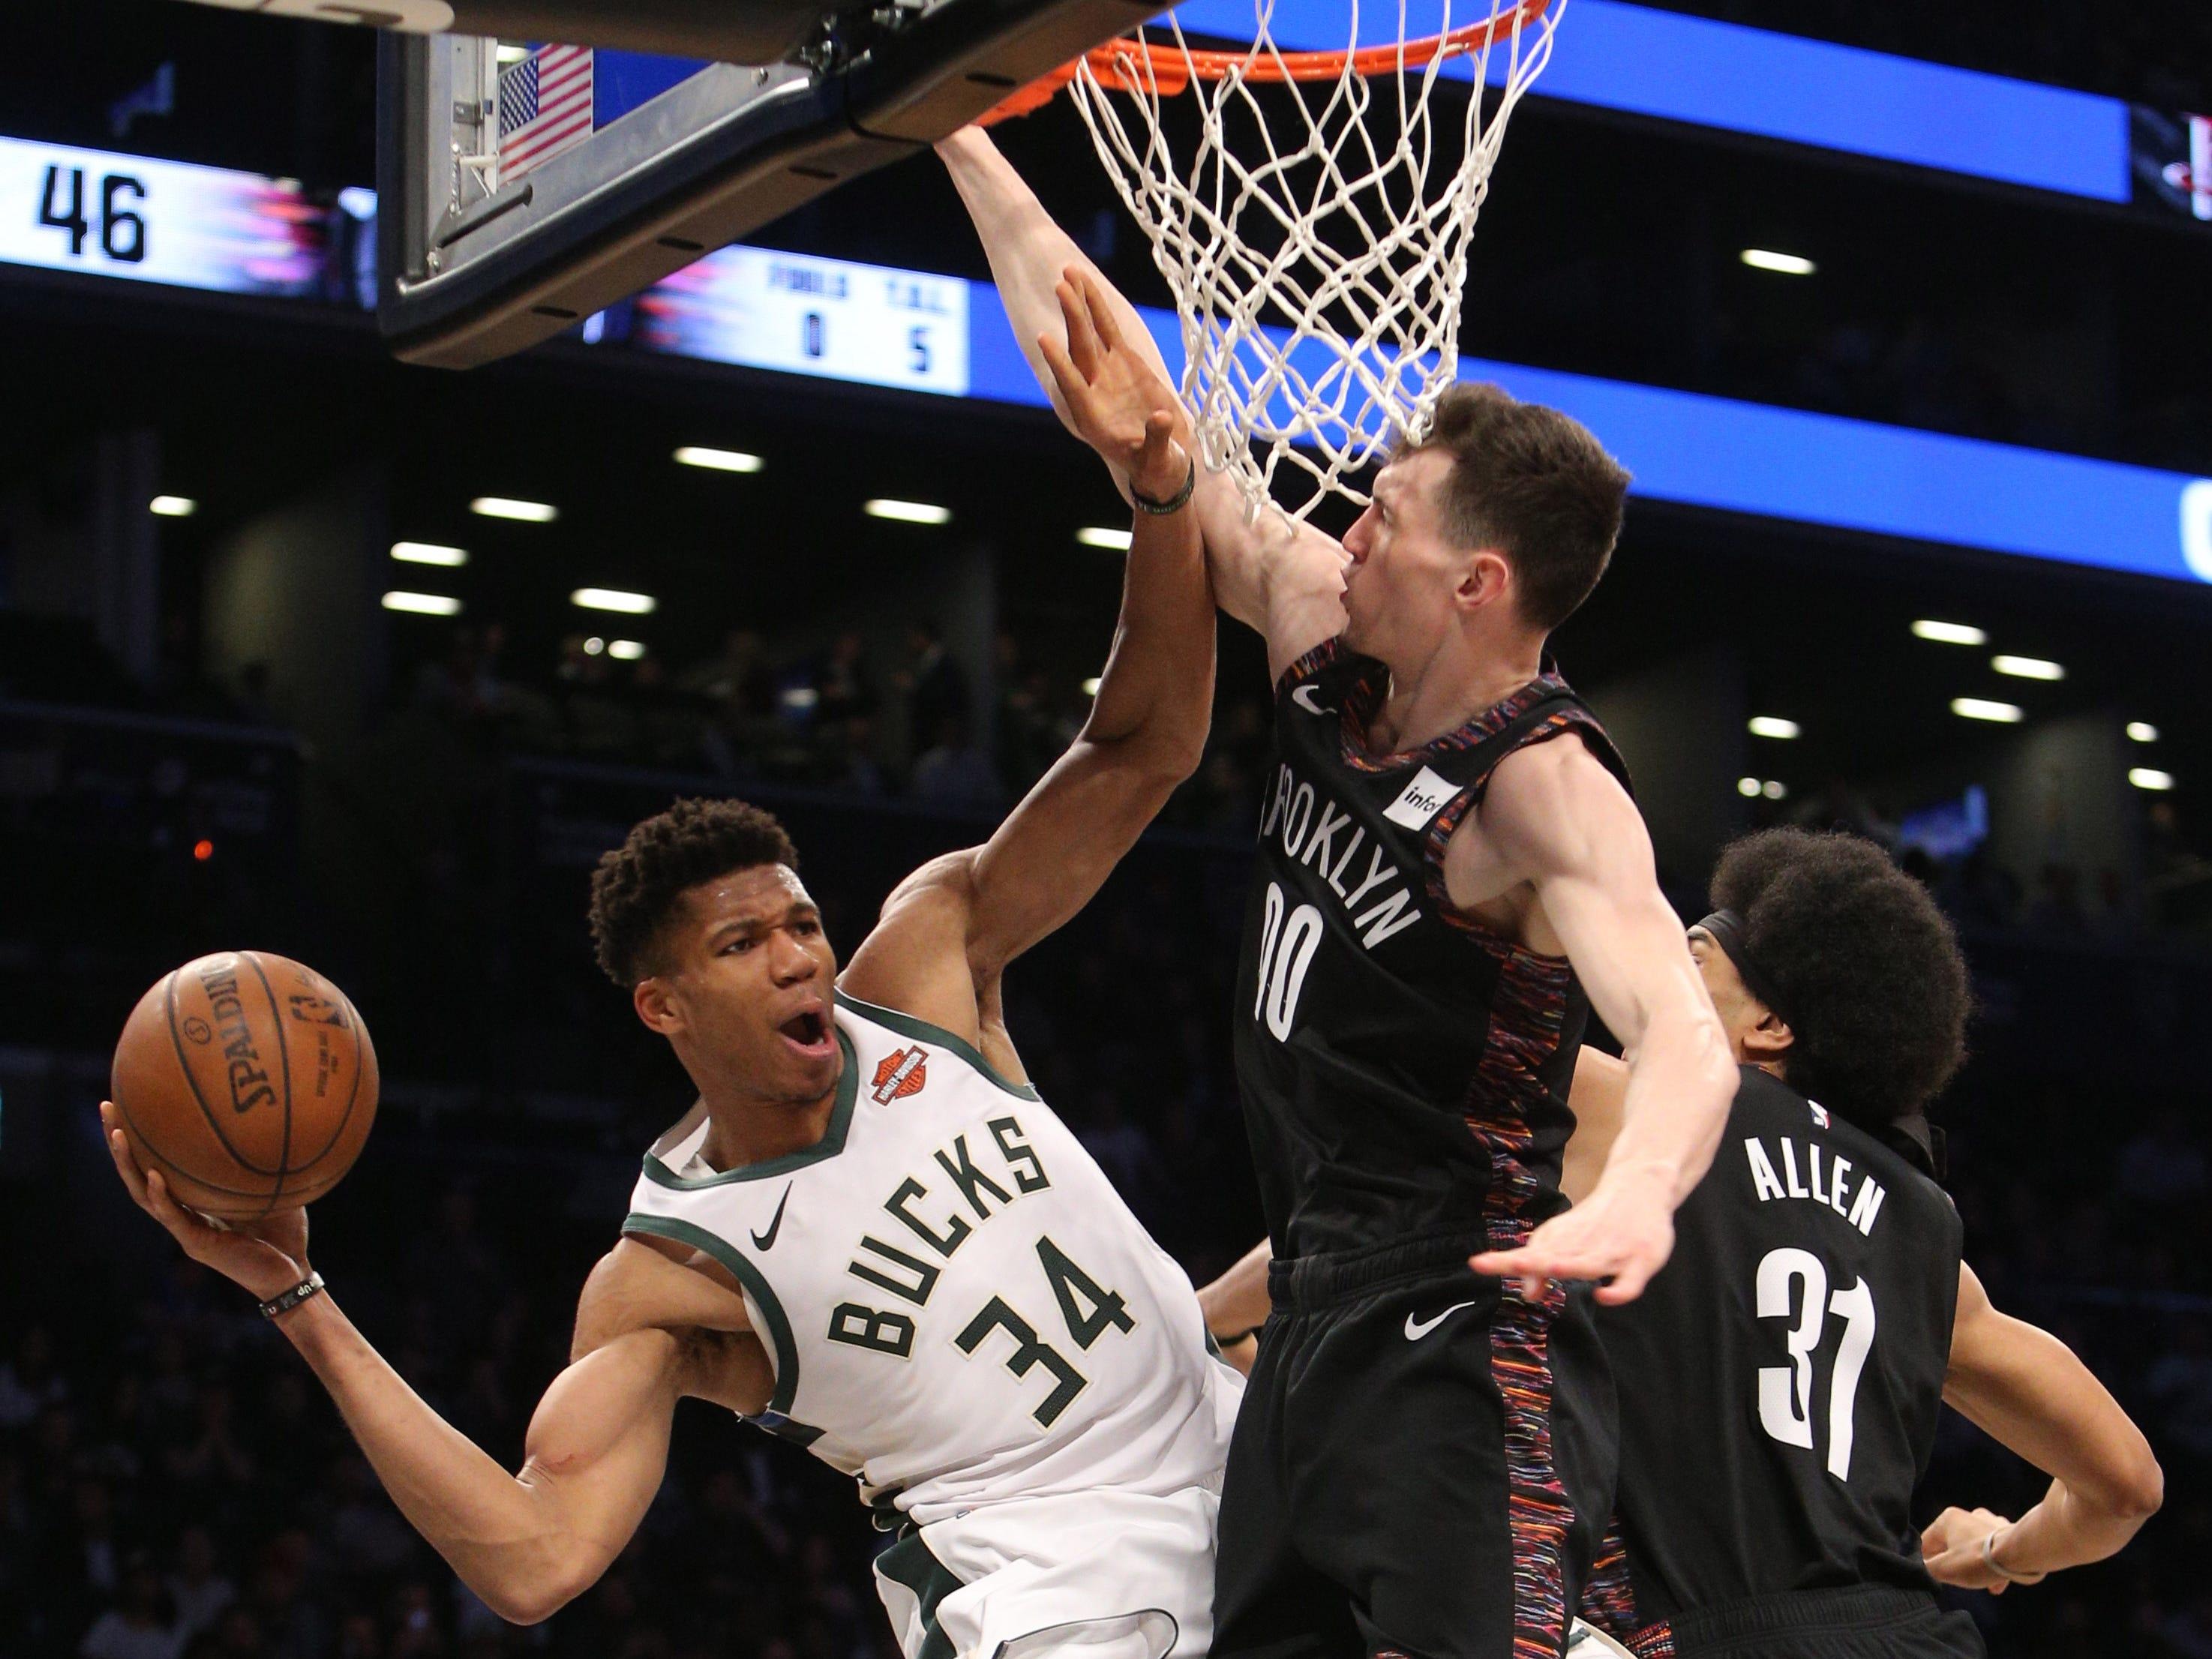 Feb. 4: Giannis Antetokounmpo passes around Brooklyn Nets small forward Rodions Kurucs (00) and center Jarrett Allen (31) during the third quarter of the Milwaukee Bucks' 113-94 win at Barclays Center.